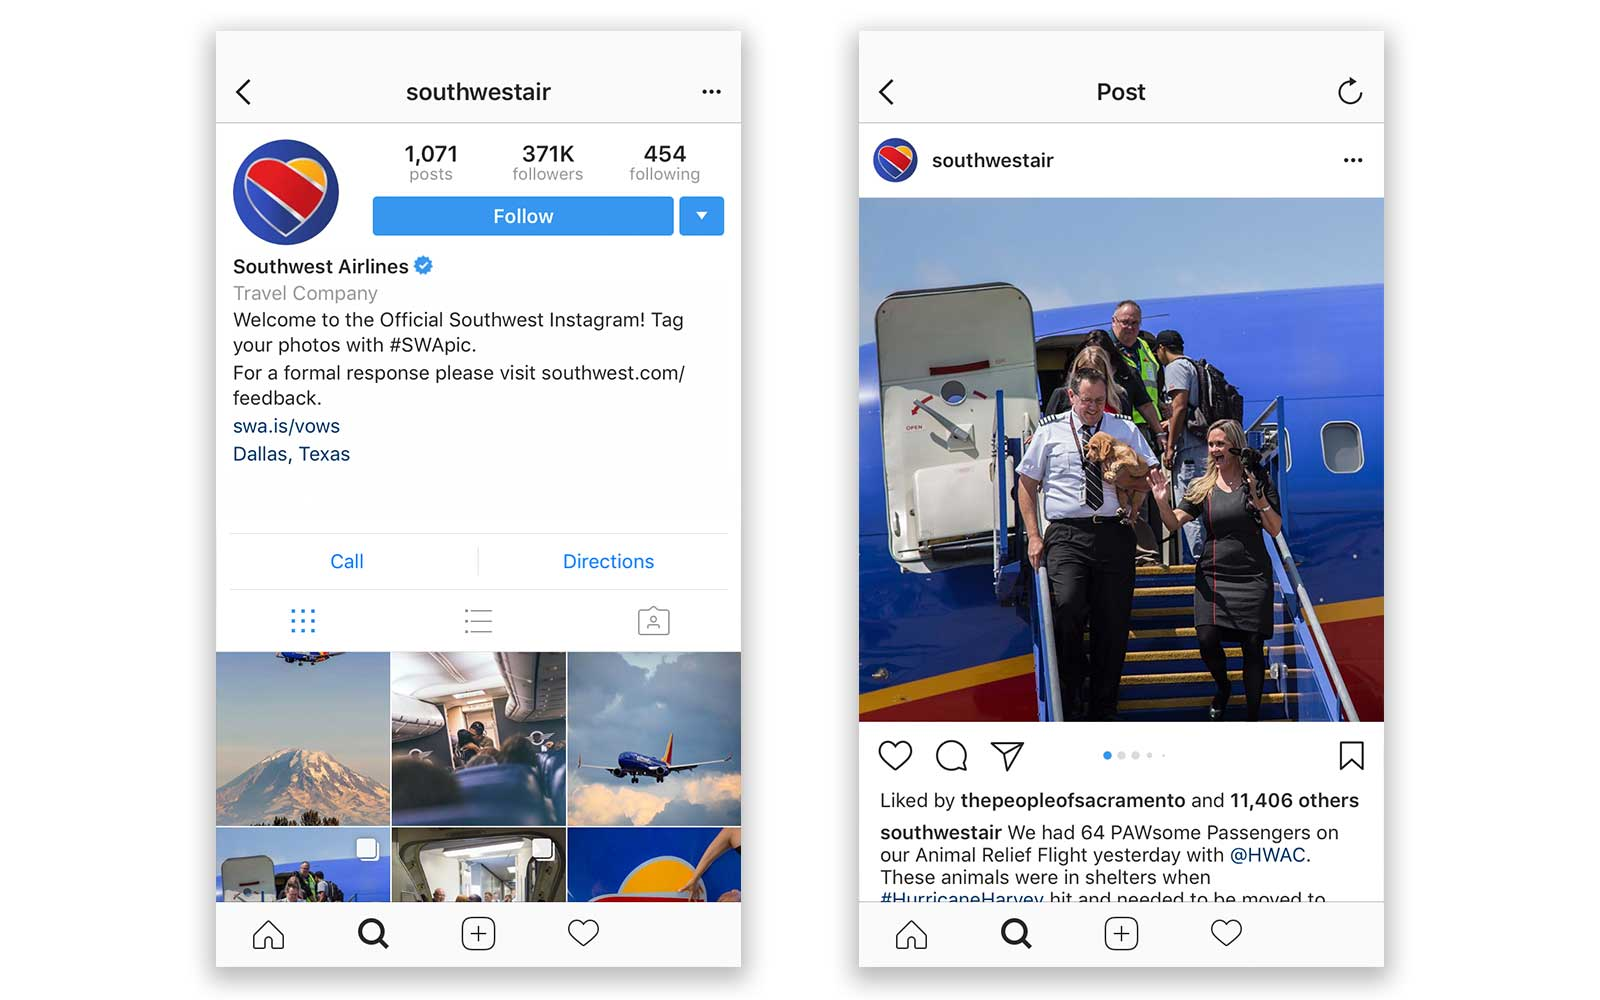 instagram account southwestair